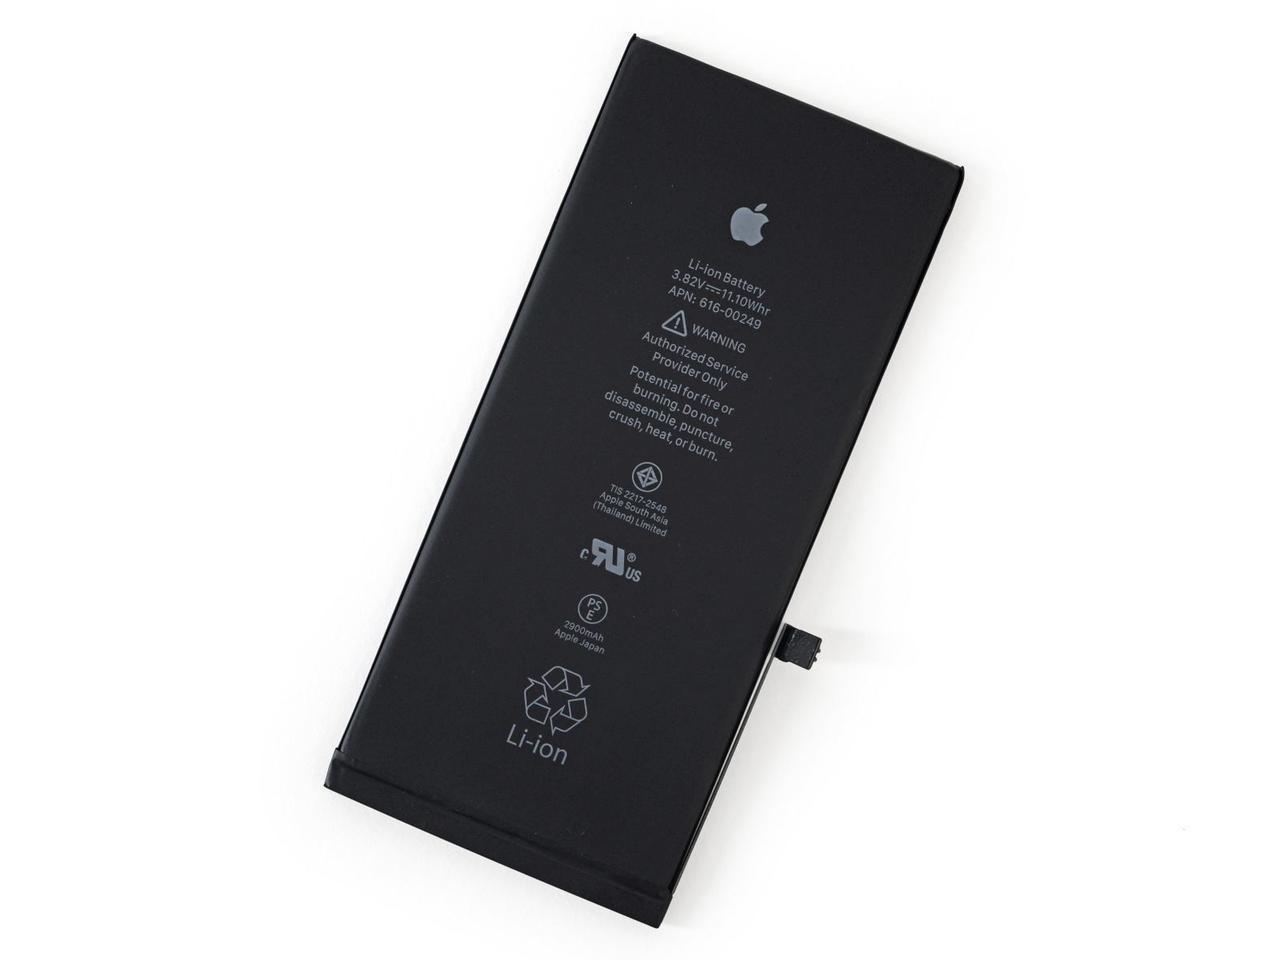 ГАРАНТИЯ! Аккумулятор / акб / батарея для iPhone 7 - Original ( Sony mfr батарея Li-ion 1960 mAh)